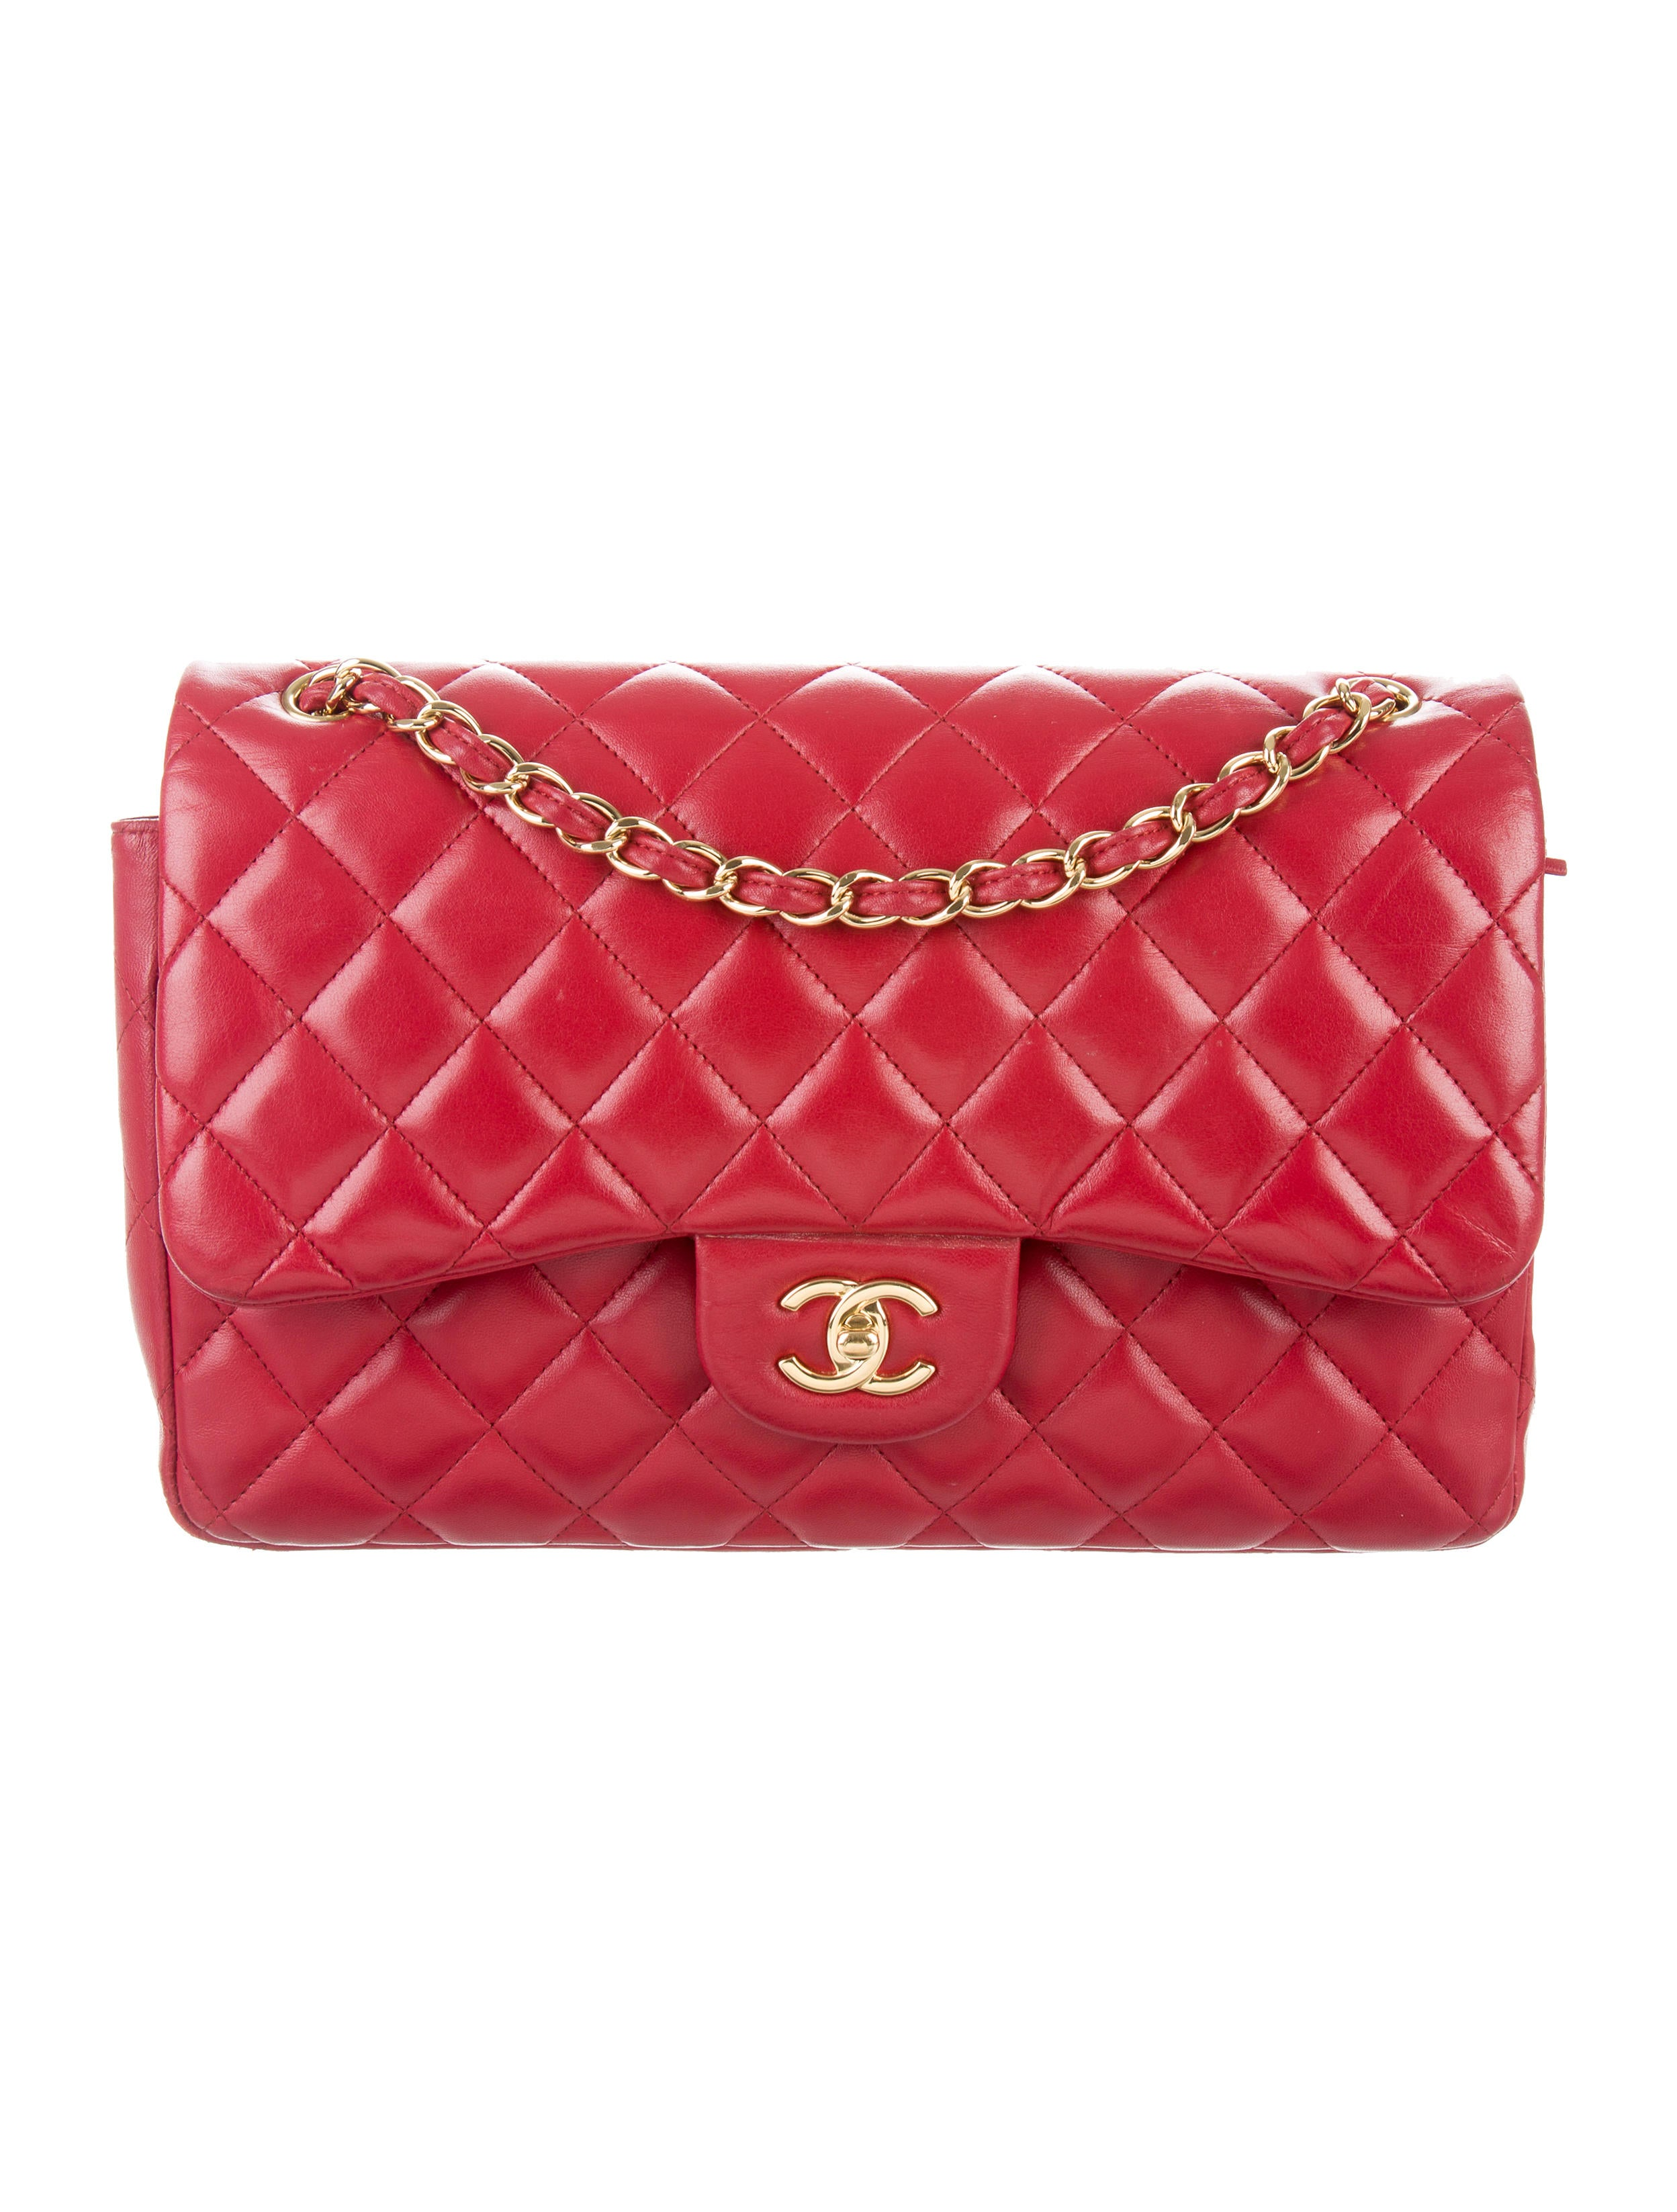 chanel 2016 classic jumbo flap bag handbags